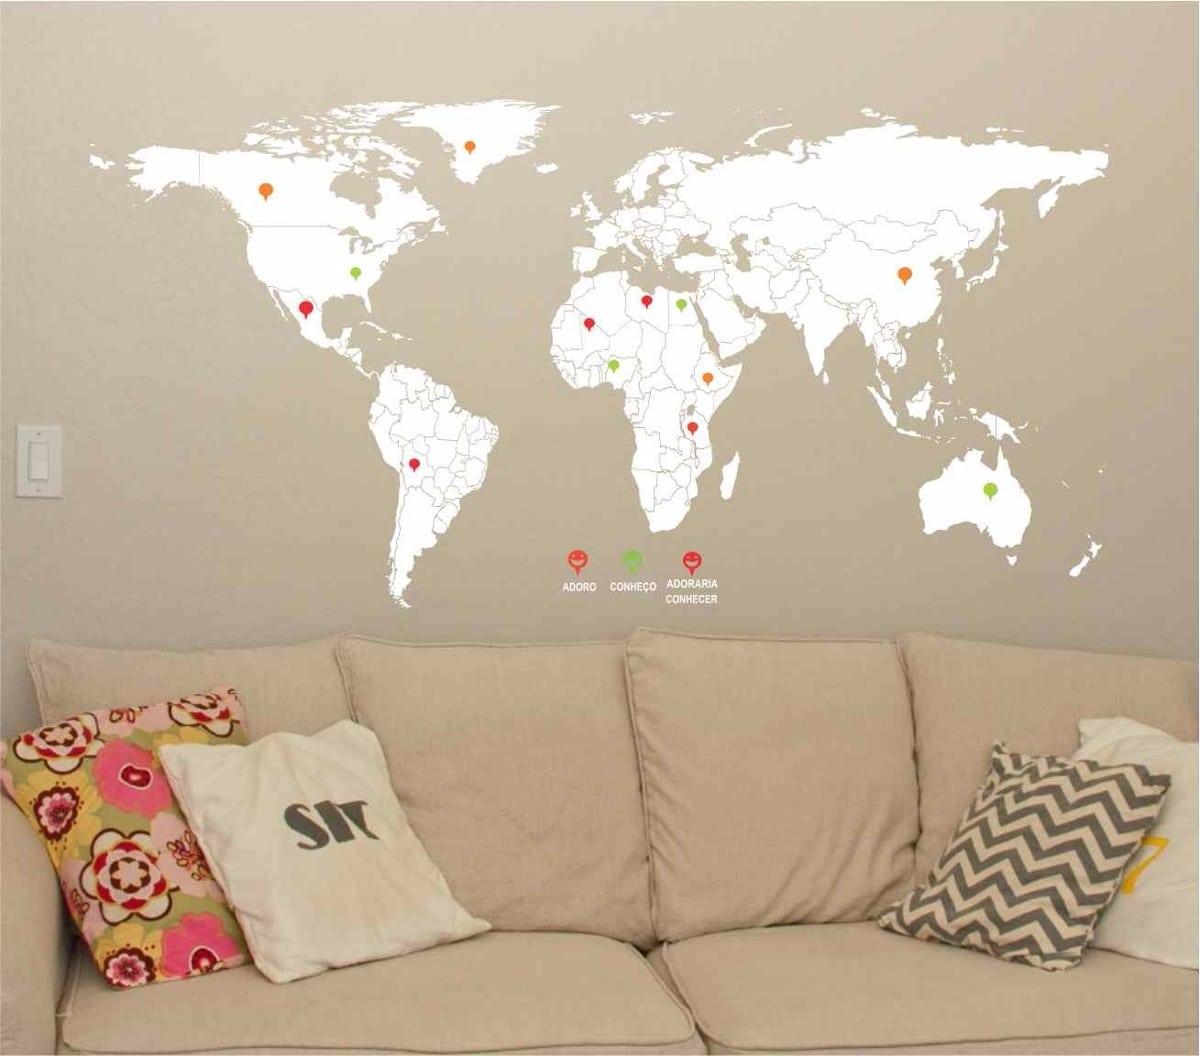 Adesivos Parede Mapa Mundi Pequeno Sala Decor Varias Cores